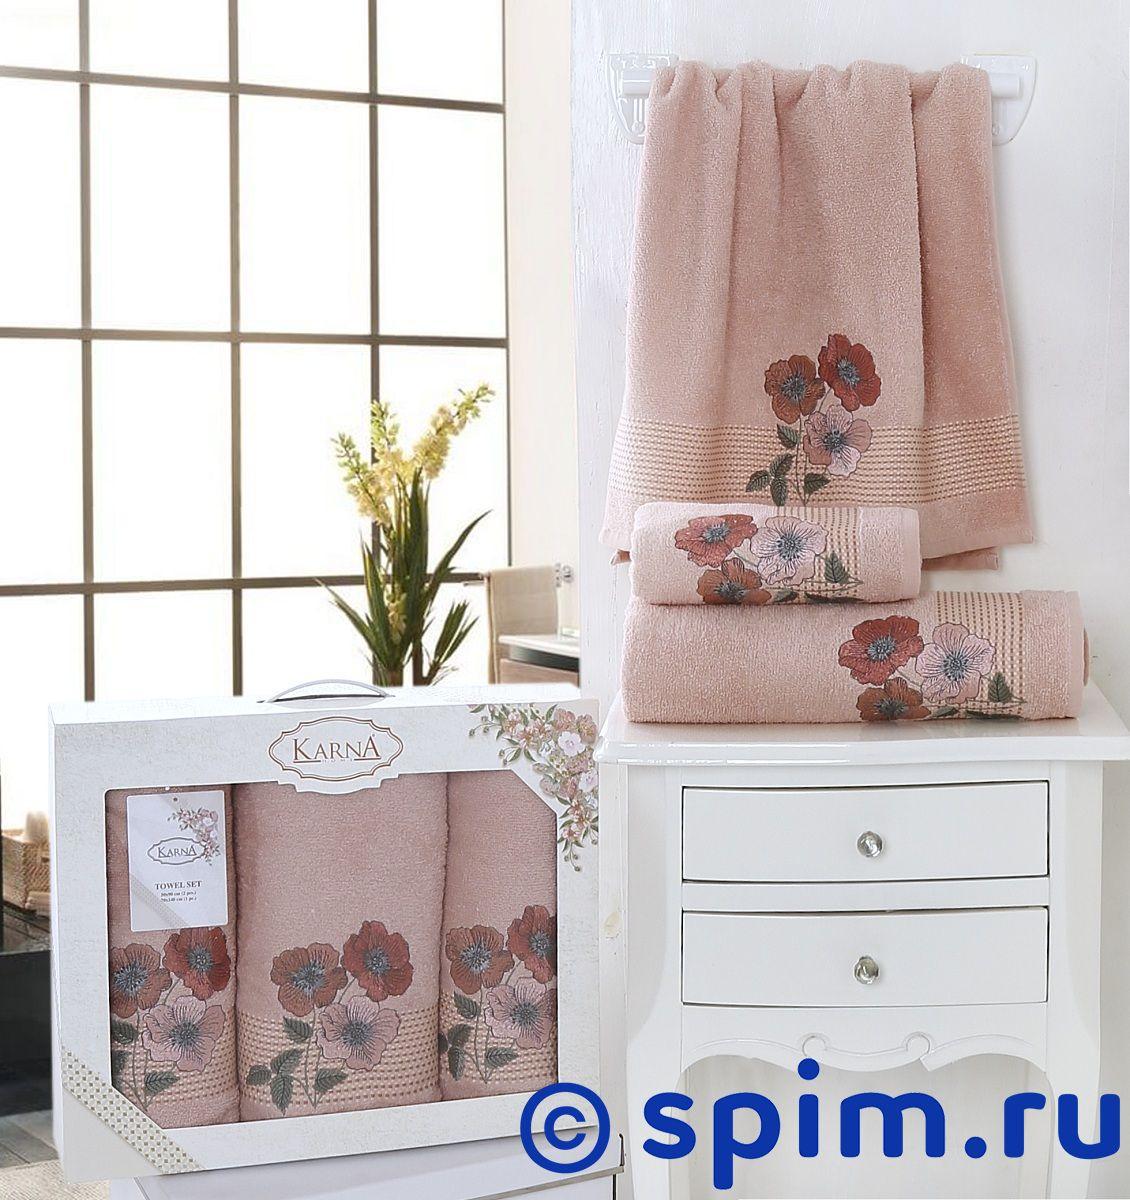 Комплект полотенец Karna Sandy, пудра арт. 2391/char003 покрывало karna покрывало evony цвет пудра 240х260 см